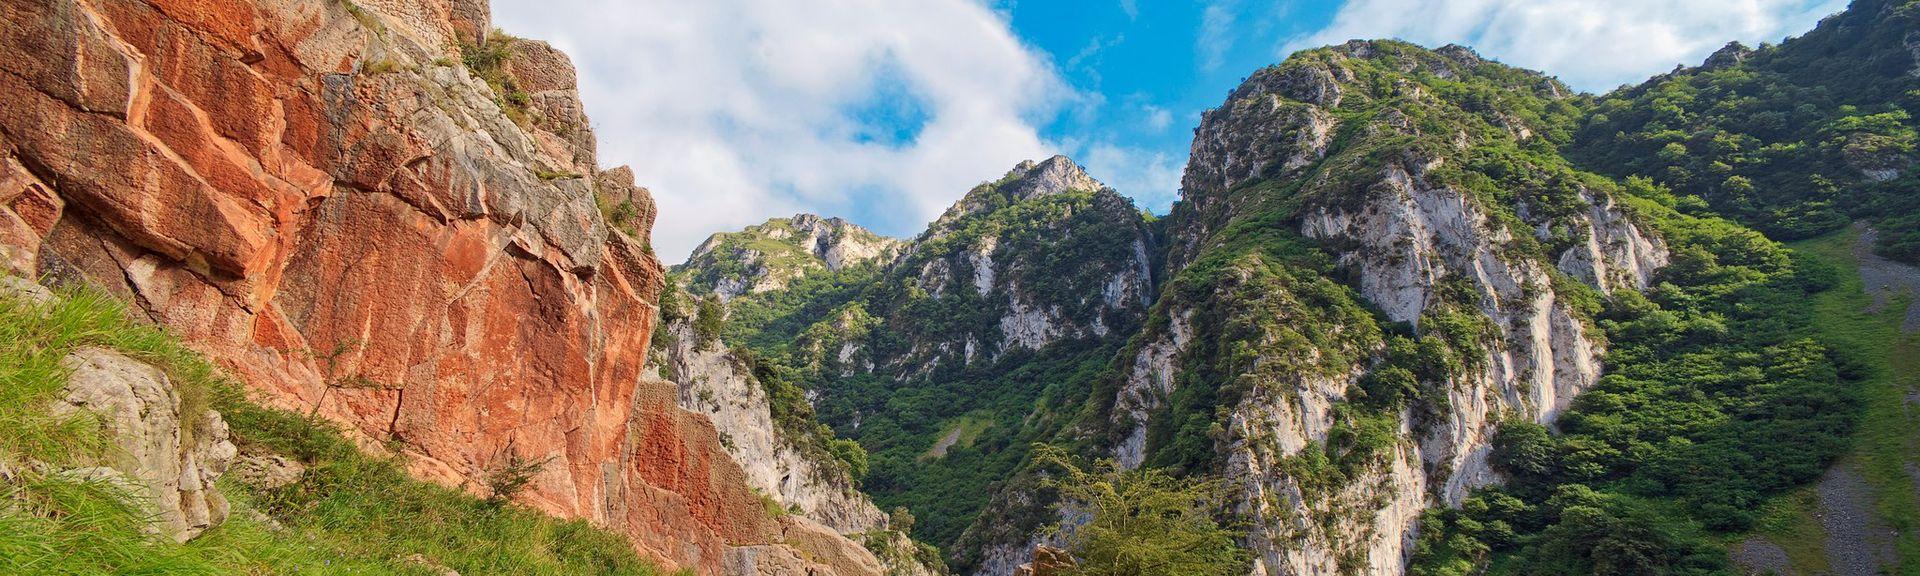 Pola de Somiedo, Somiedo, Asturias, Spain